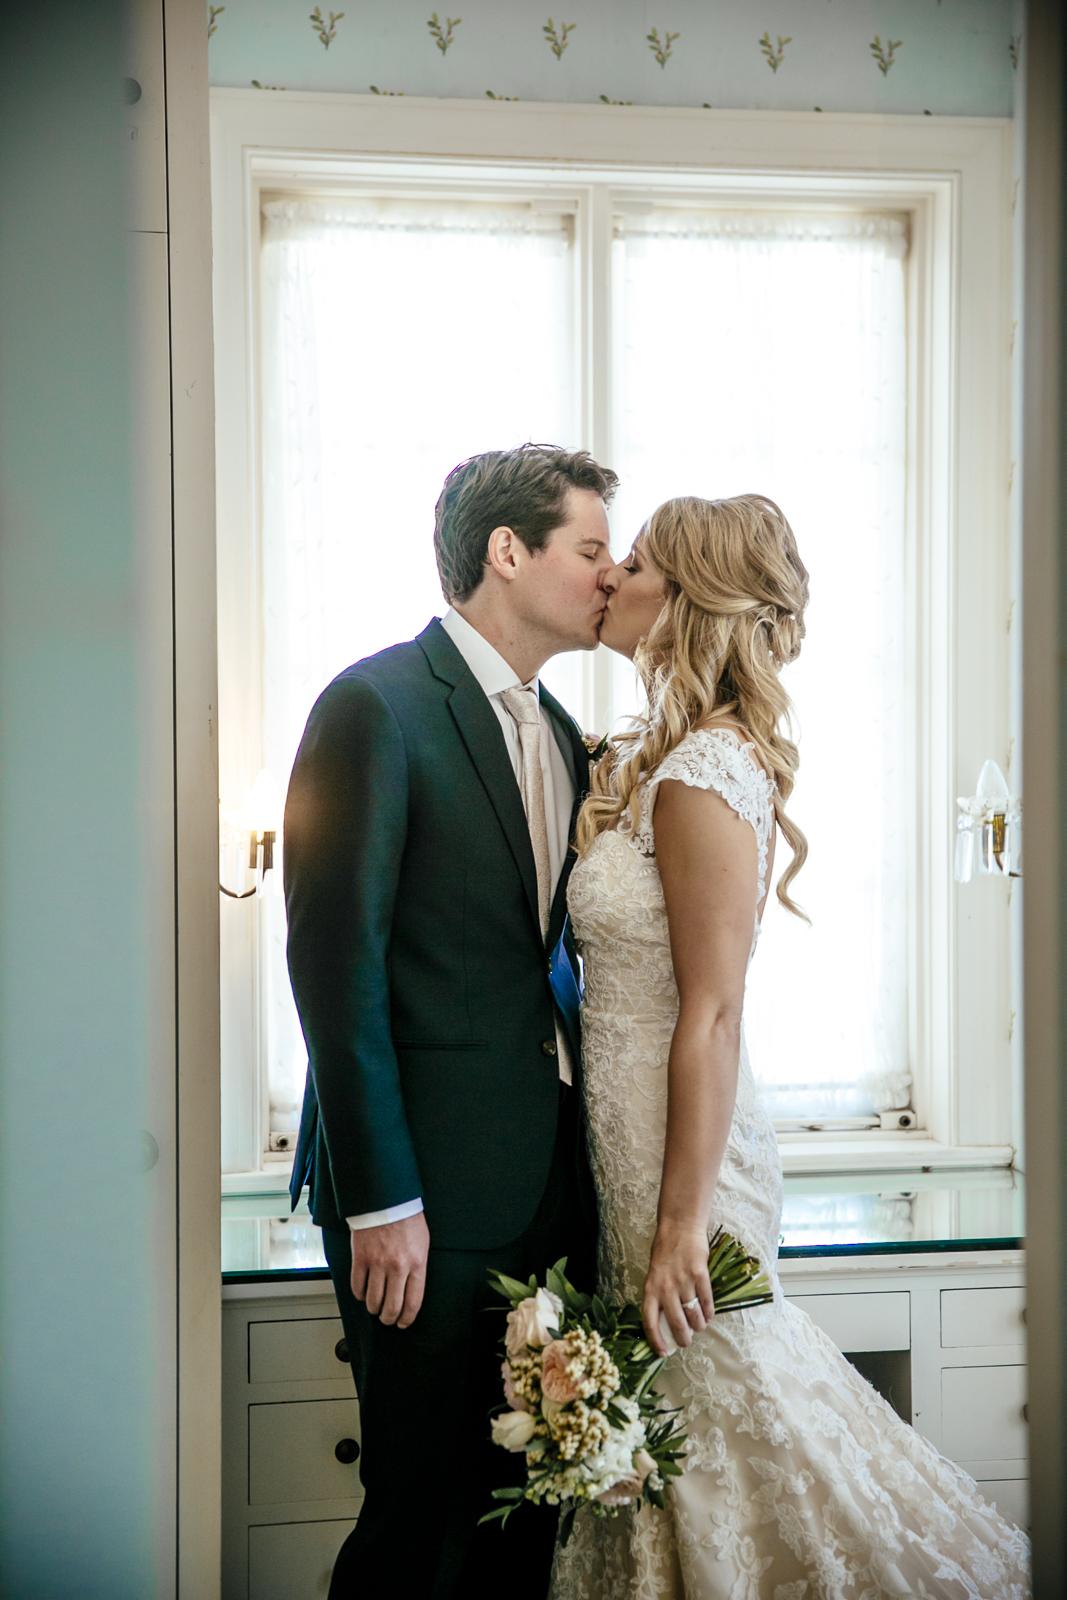 0020_CHRISTINE_&_MATT_WEDDING_DARLINGTON_HOUSE_2016IMG_3481.JPG